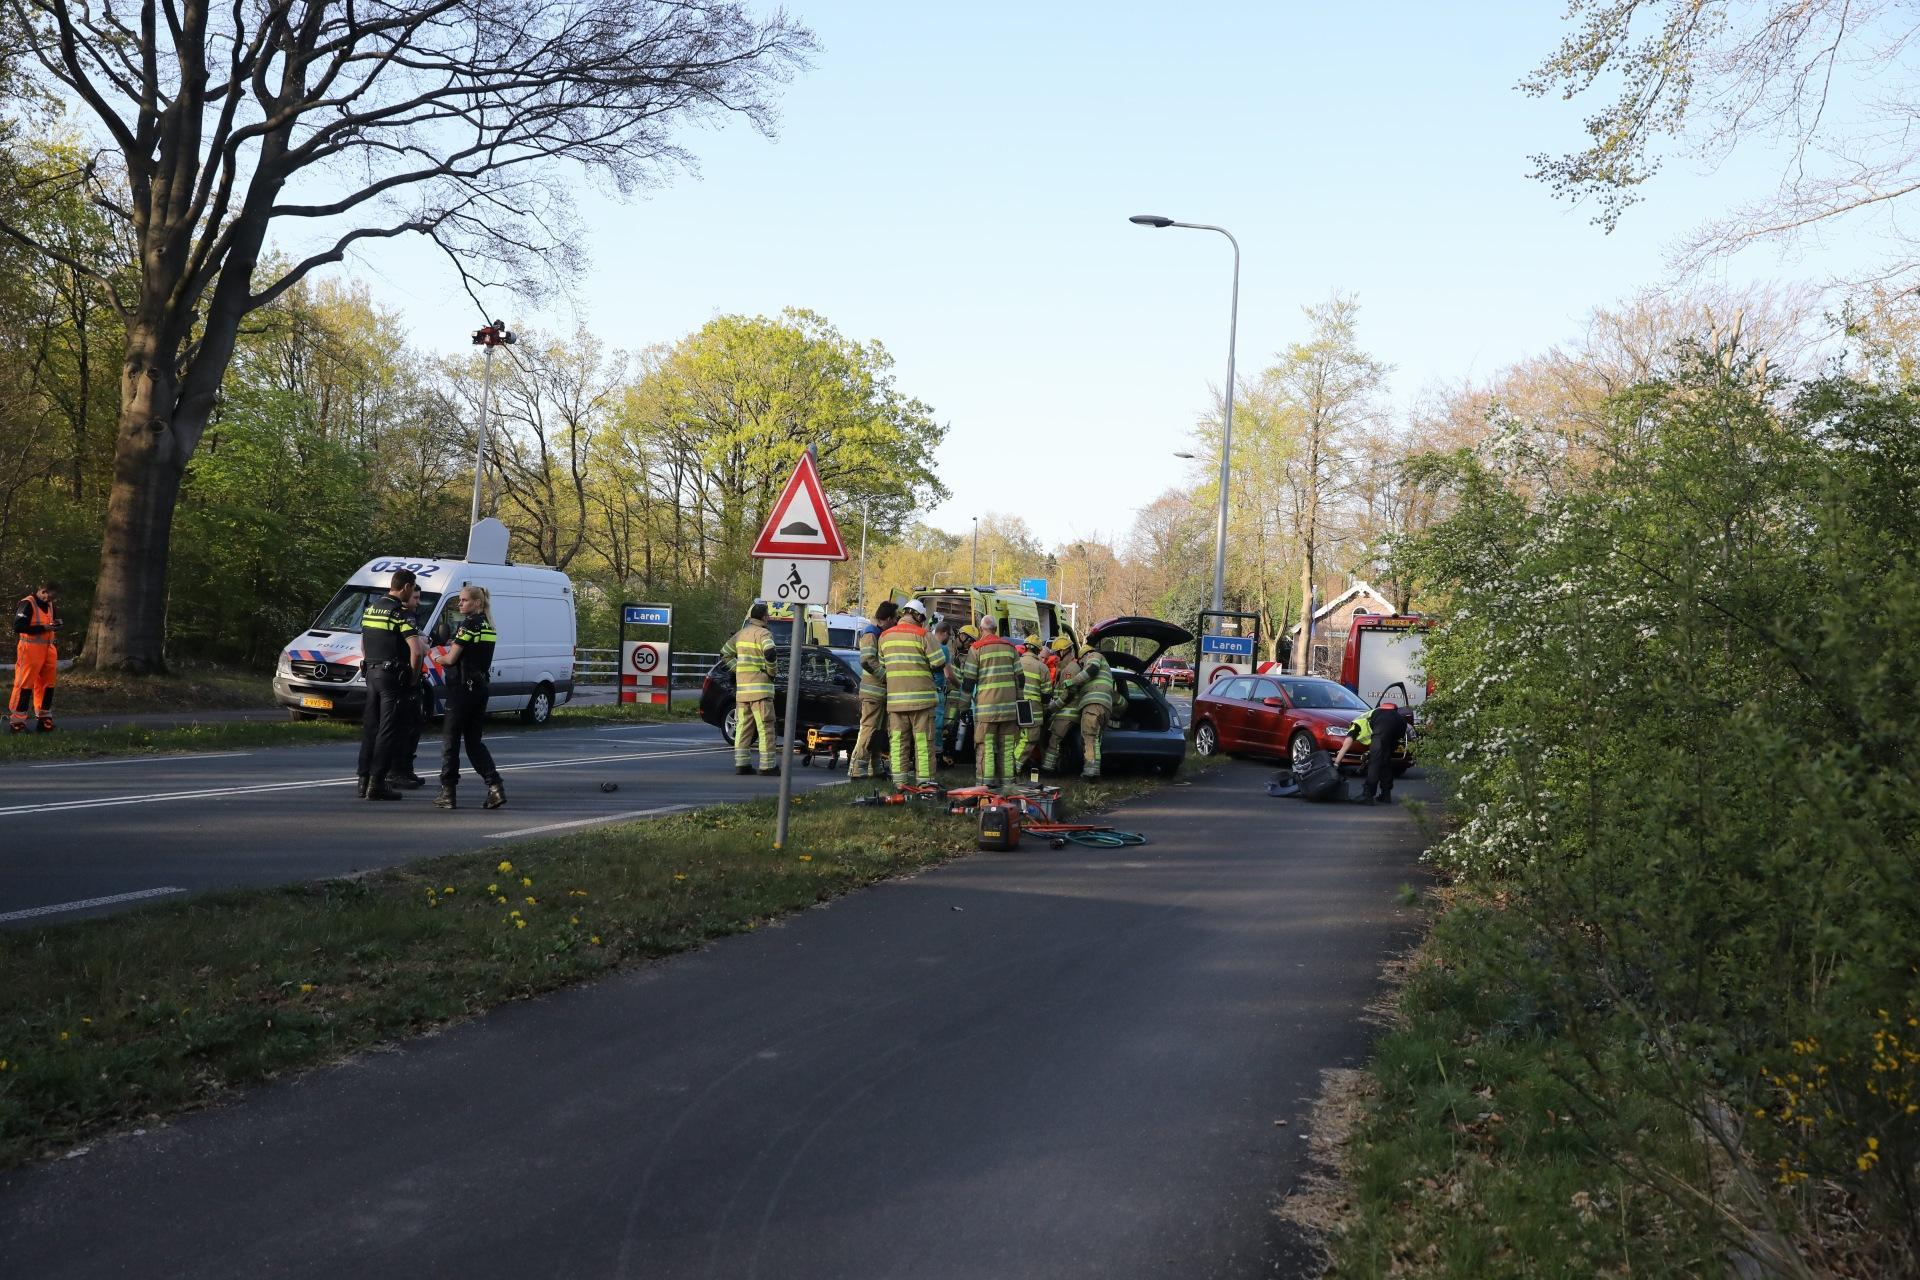 Vrouw uit auto bevrijd na frontale botsing op Hilversumseweg, ook taxichauffeur gewond